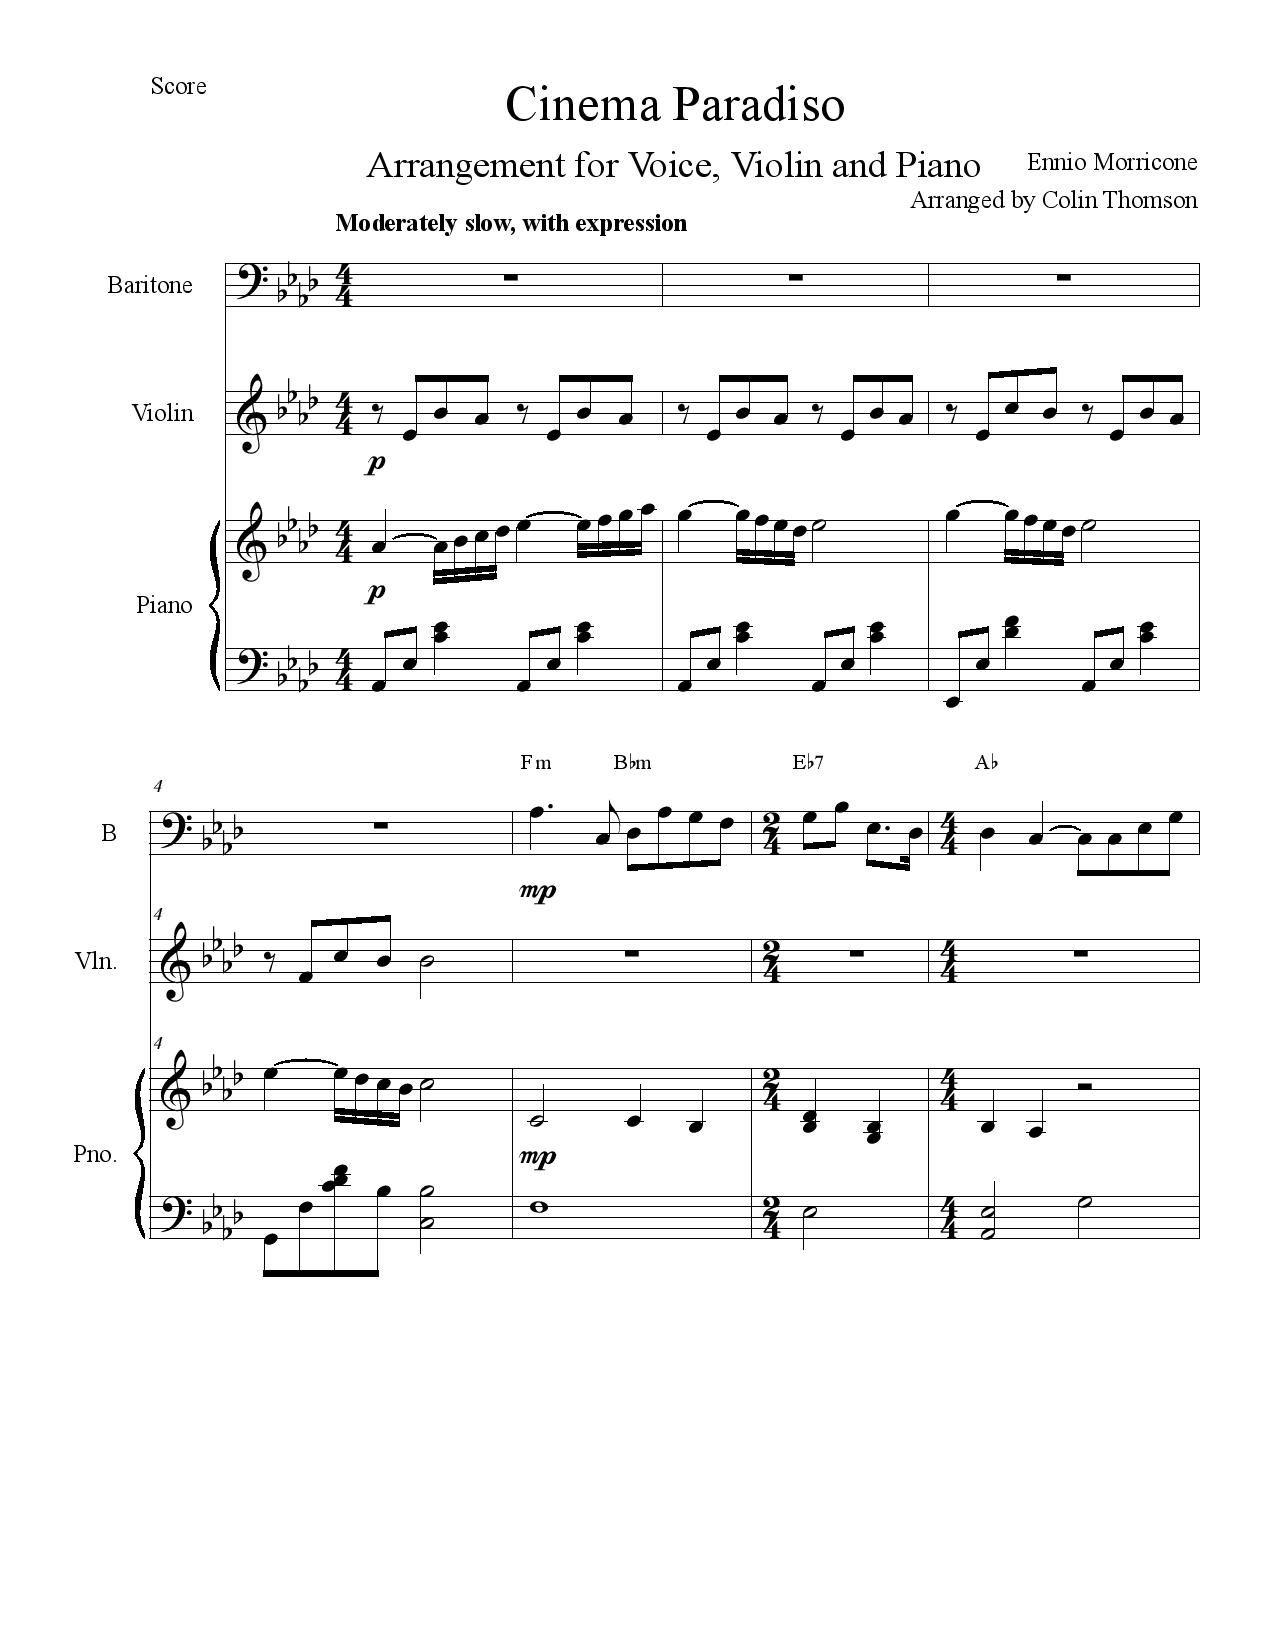 Free Sheet Music Josh Groban Cinema Paradiso By Ennio Morricone